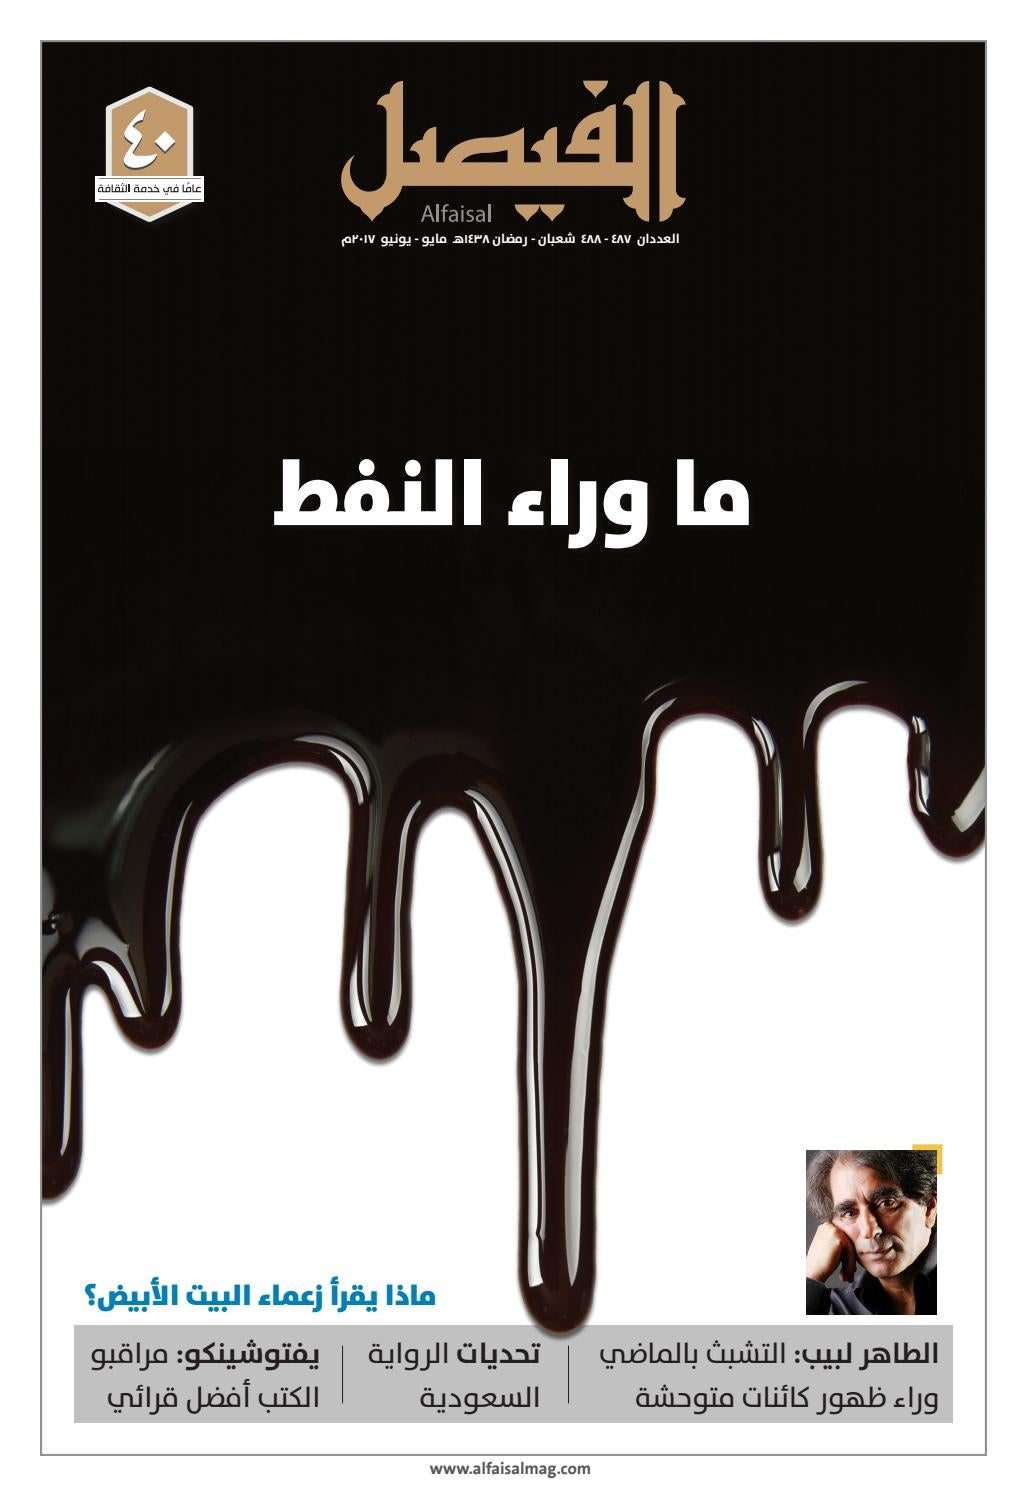 fb71d20a2289a assuu 487 488مجلة الفيصل by yanal Isak - issuu